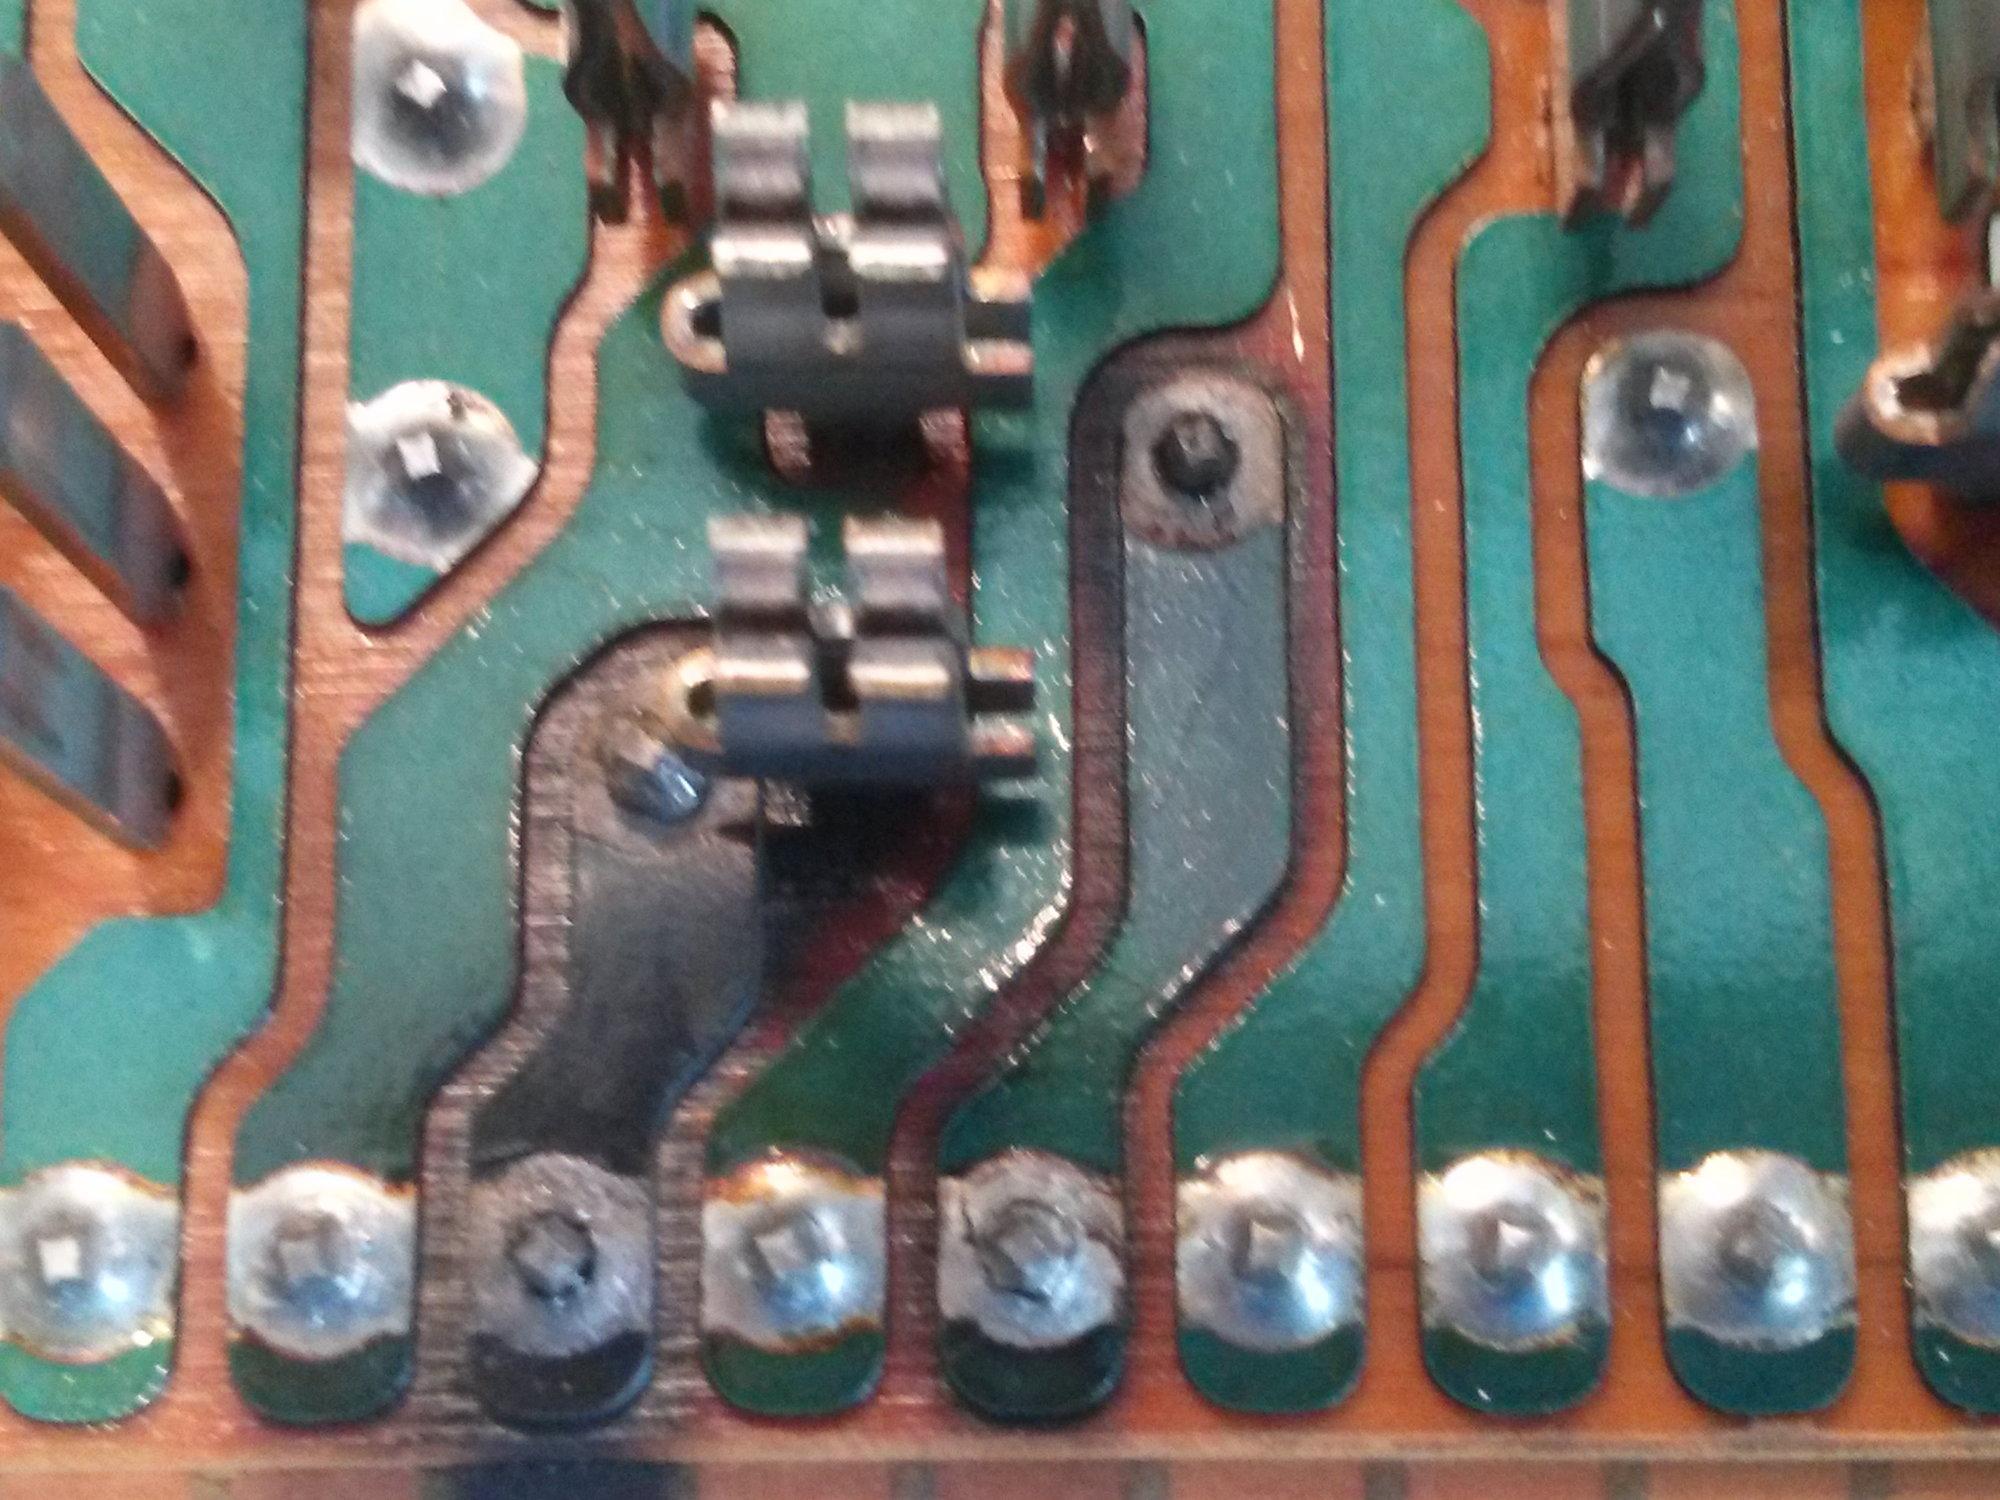 mk5 escort fuse box repair - some advice please - passionford - ford focus,  escort & rs forum discussion  passionford